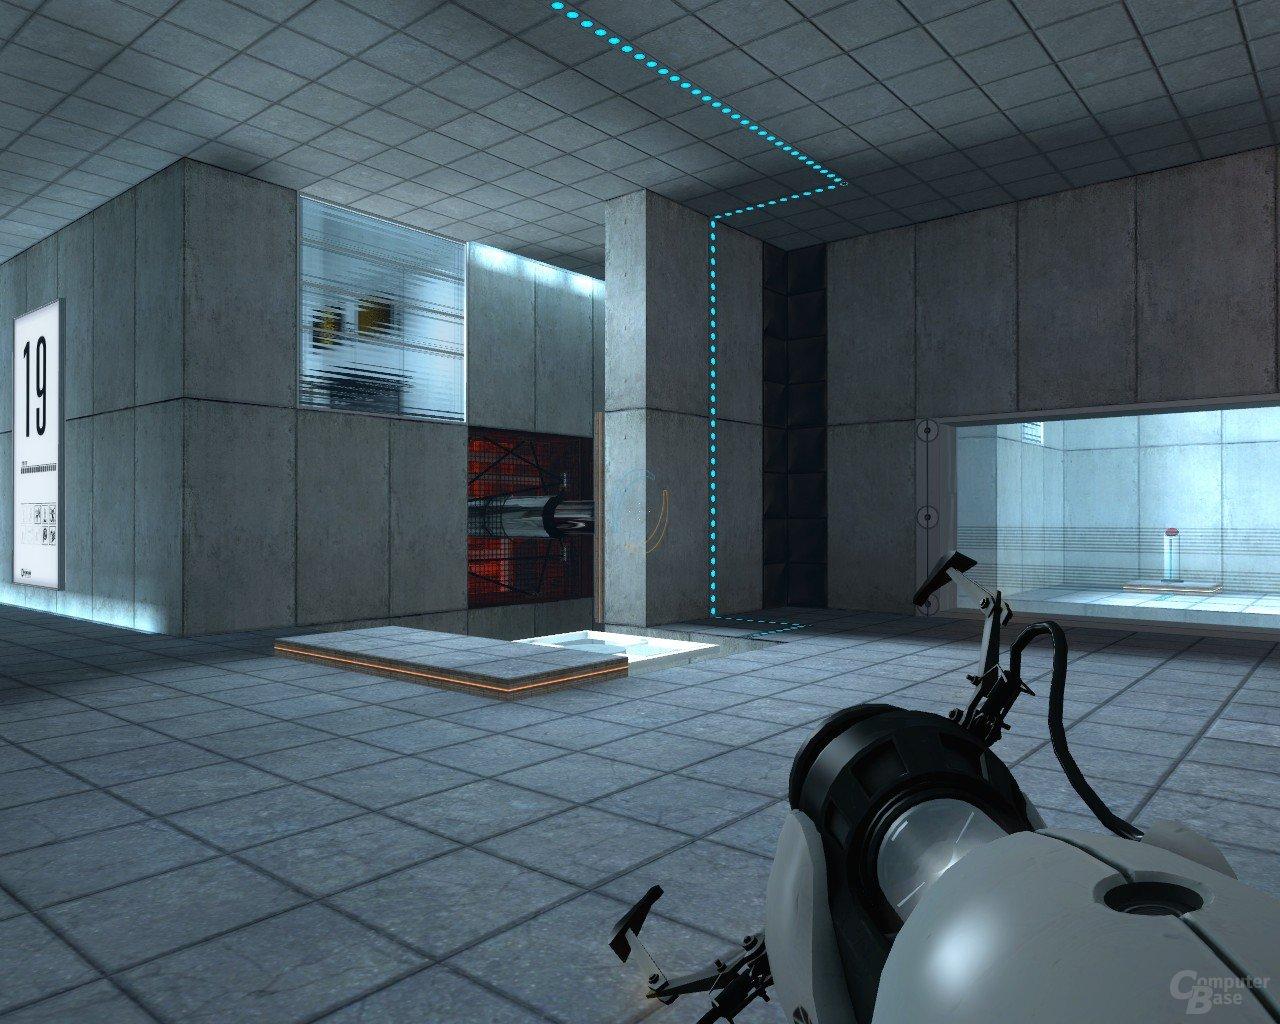 Portal: Dem Ziel so nah und doch so fern